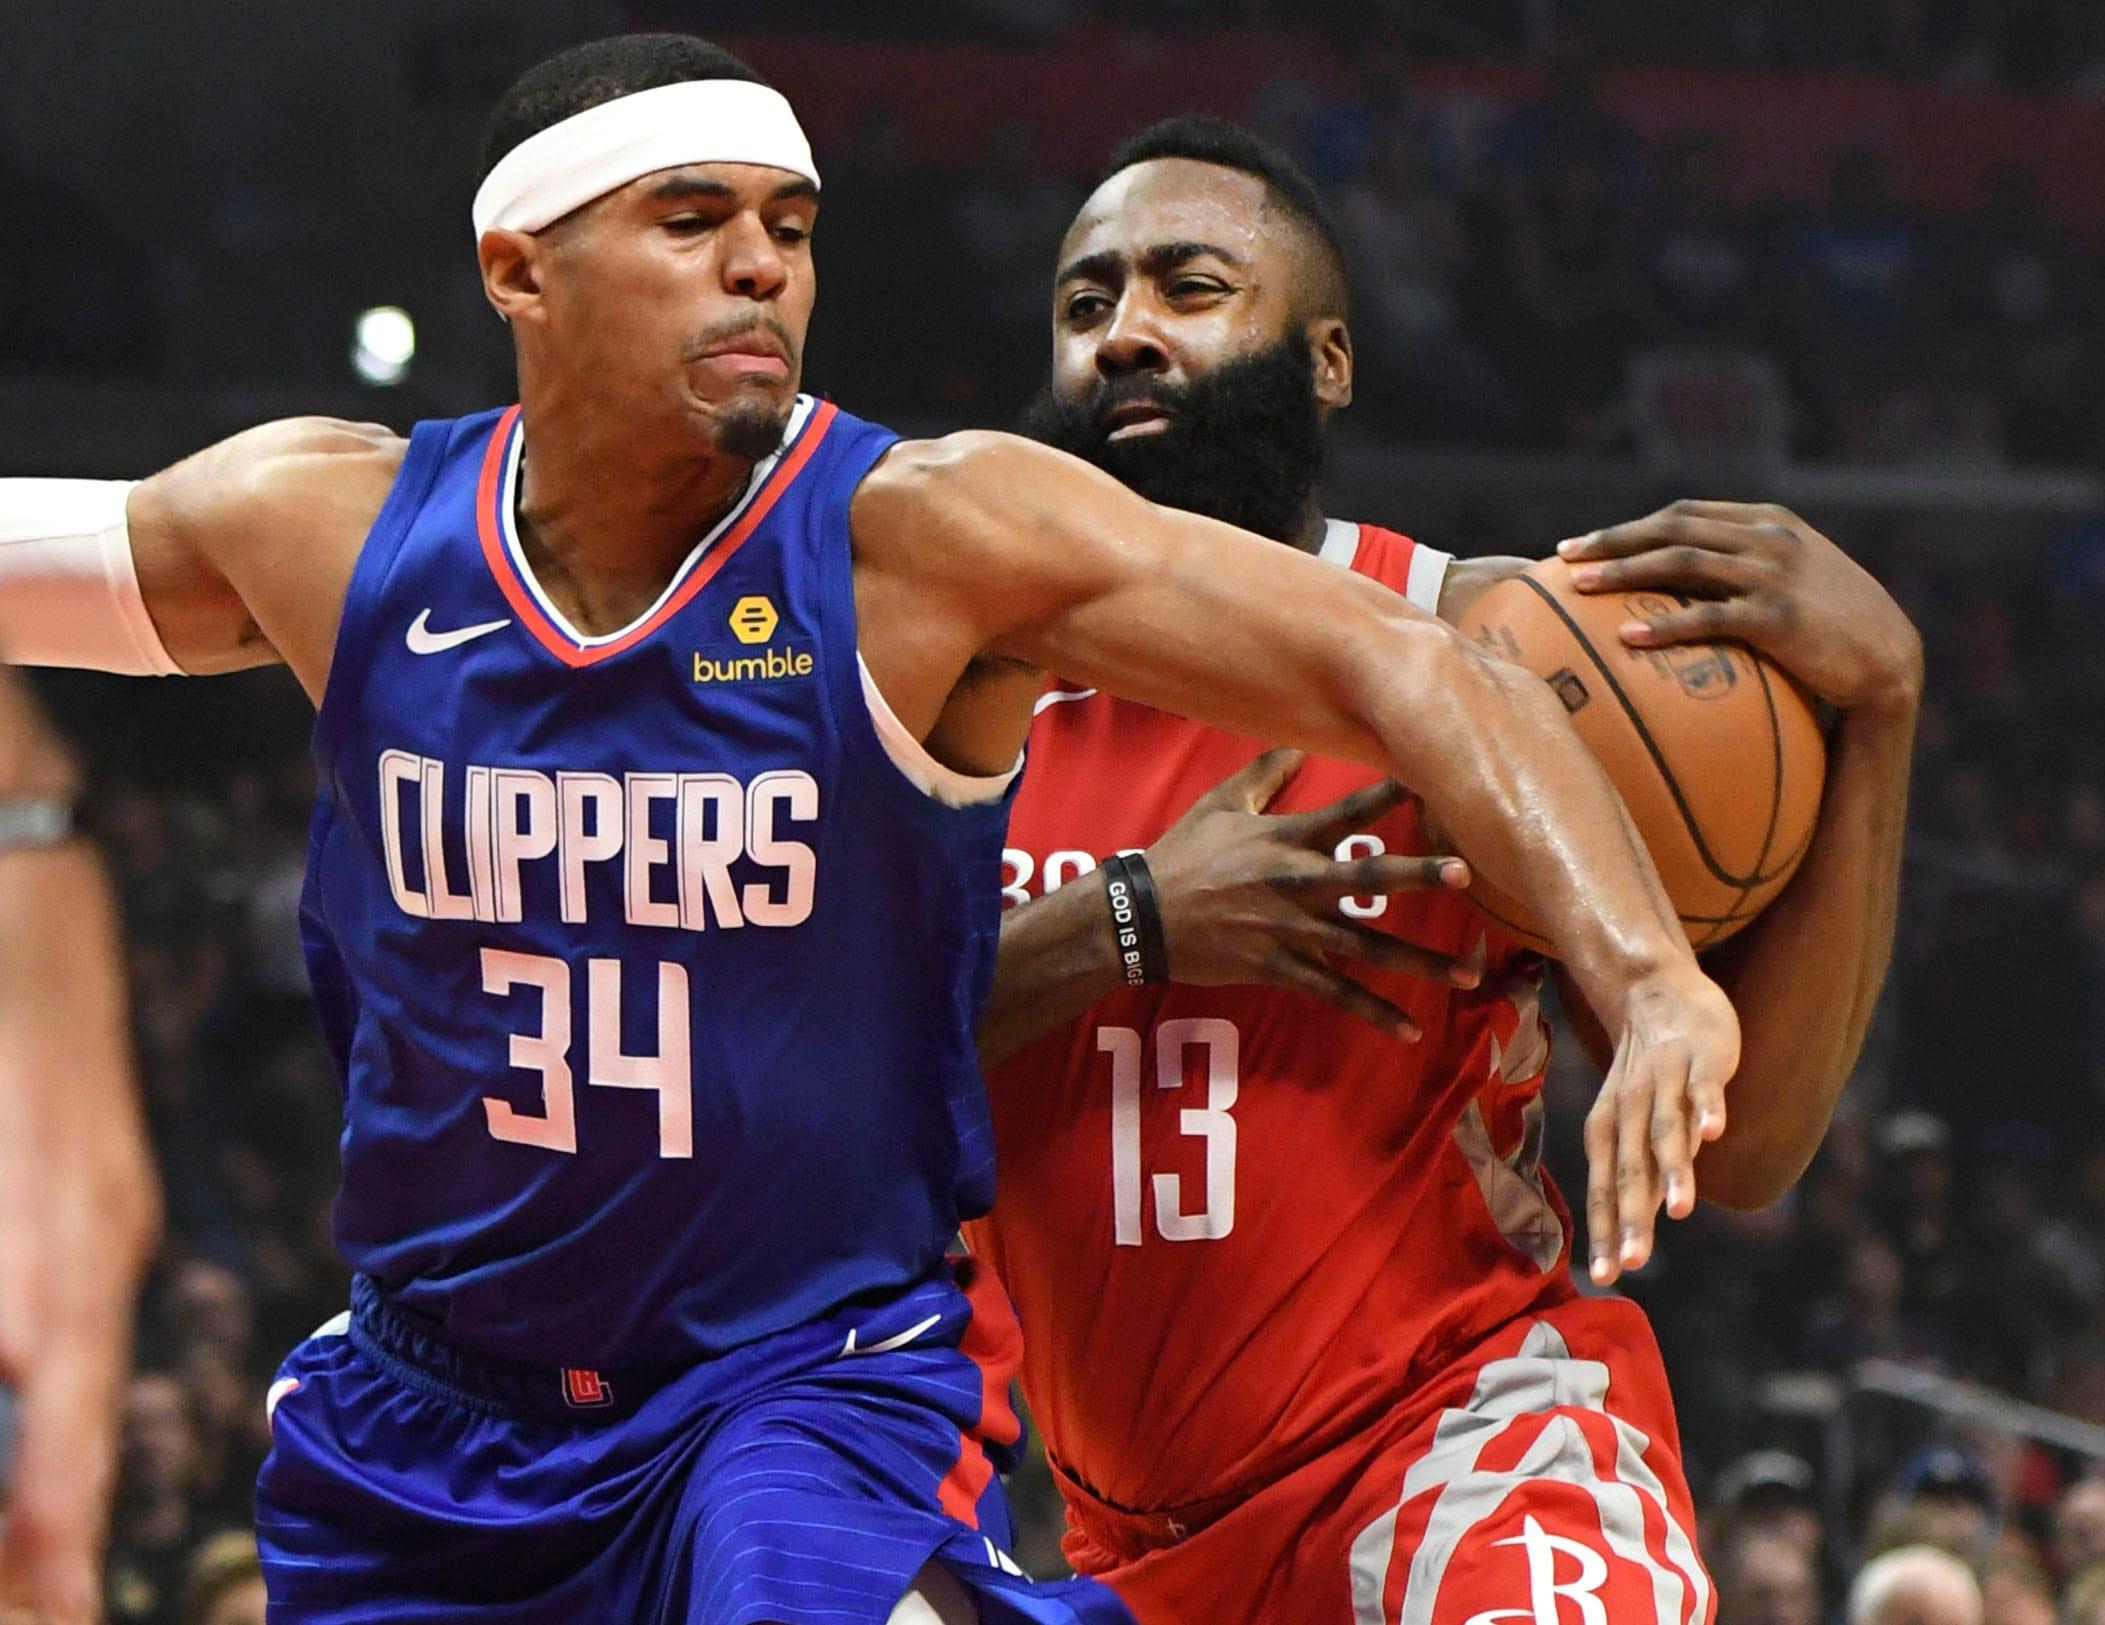 James Harden says Rockets already feeling heat as teams target Houston with tough play